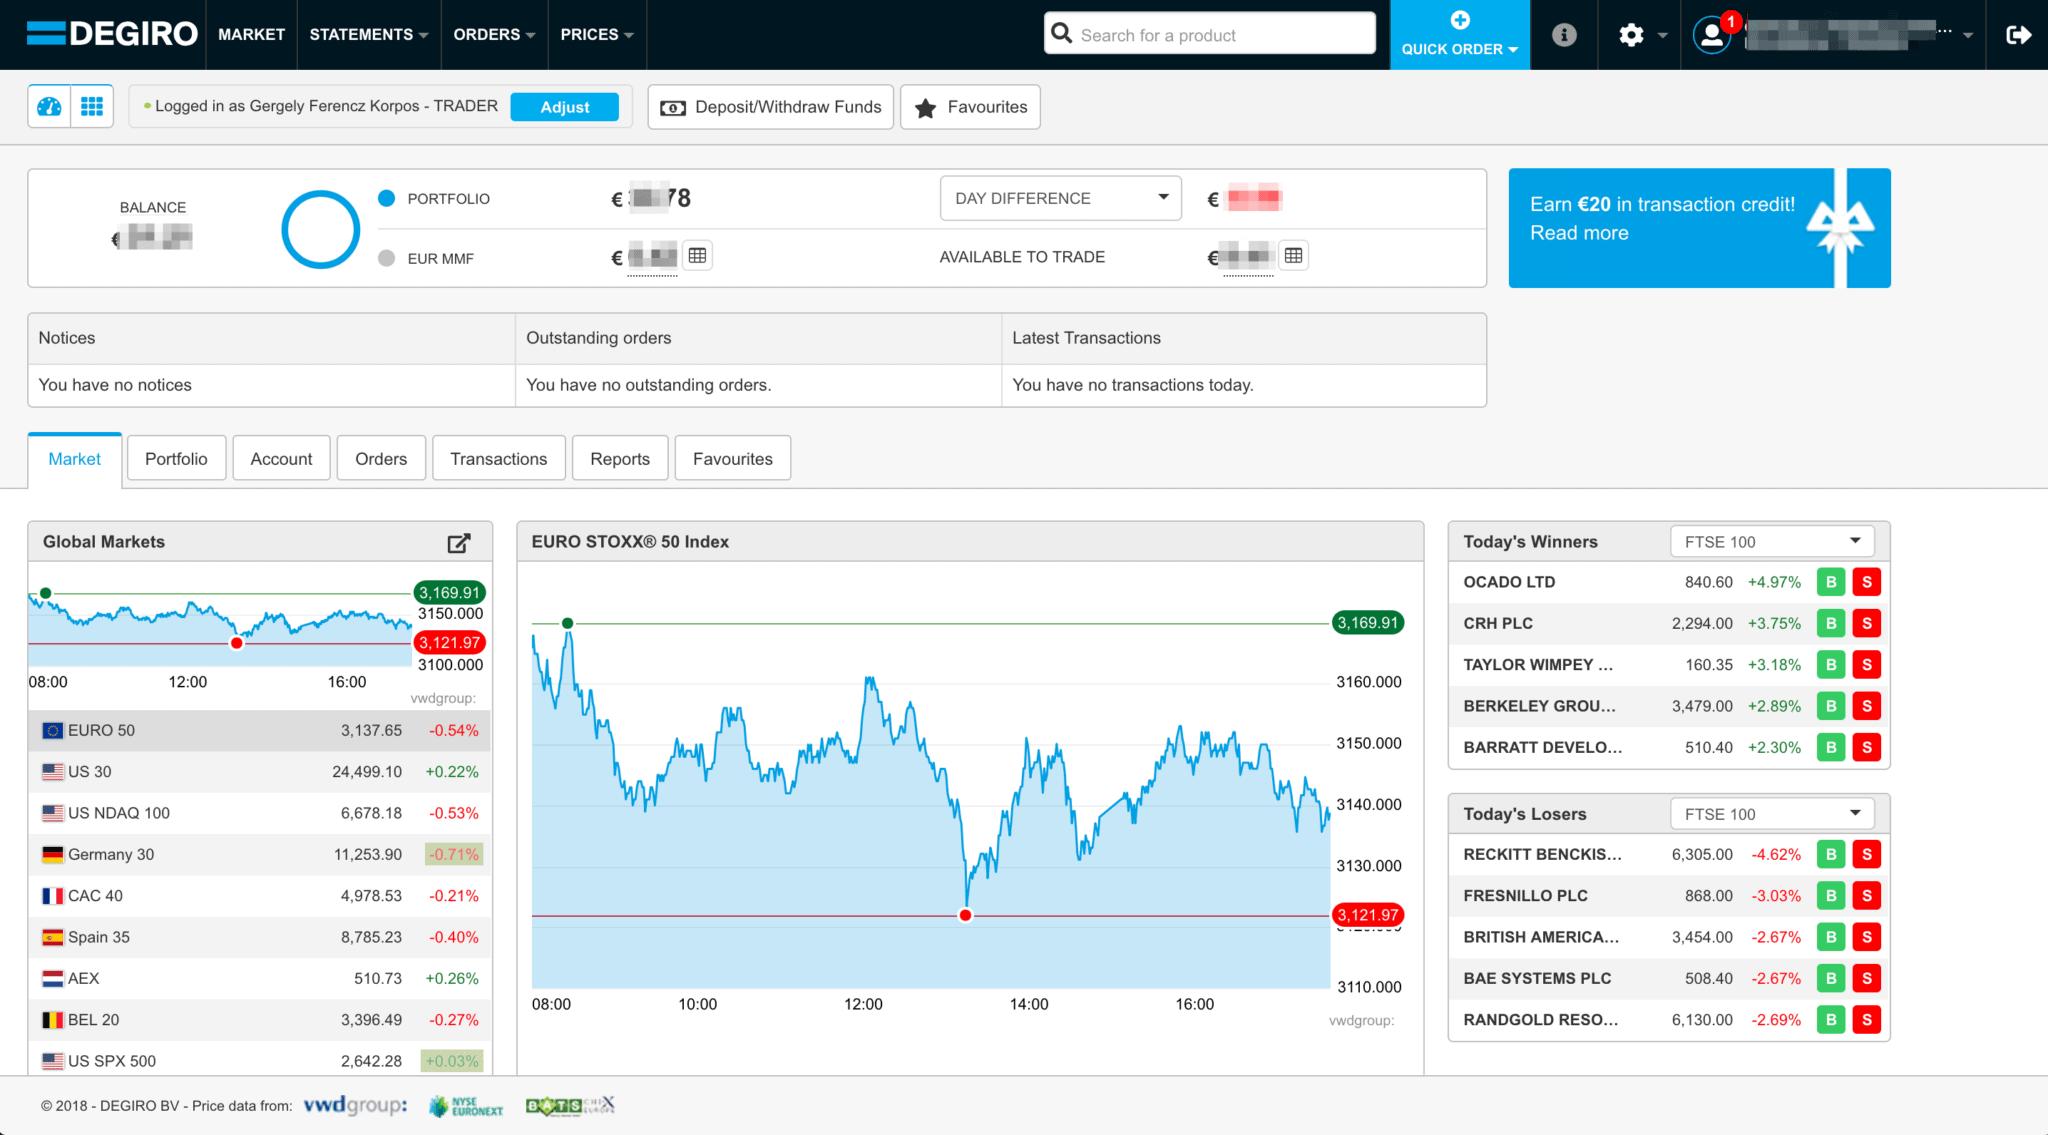 Degiro Trading Platform